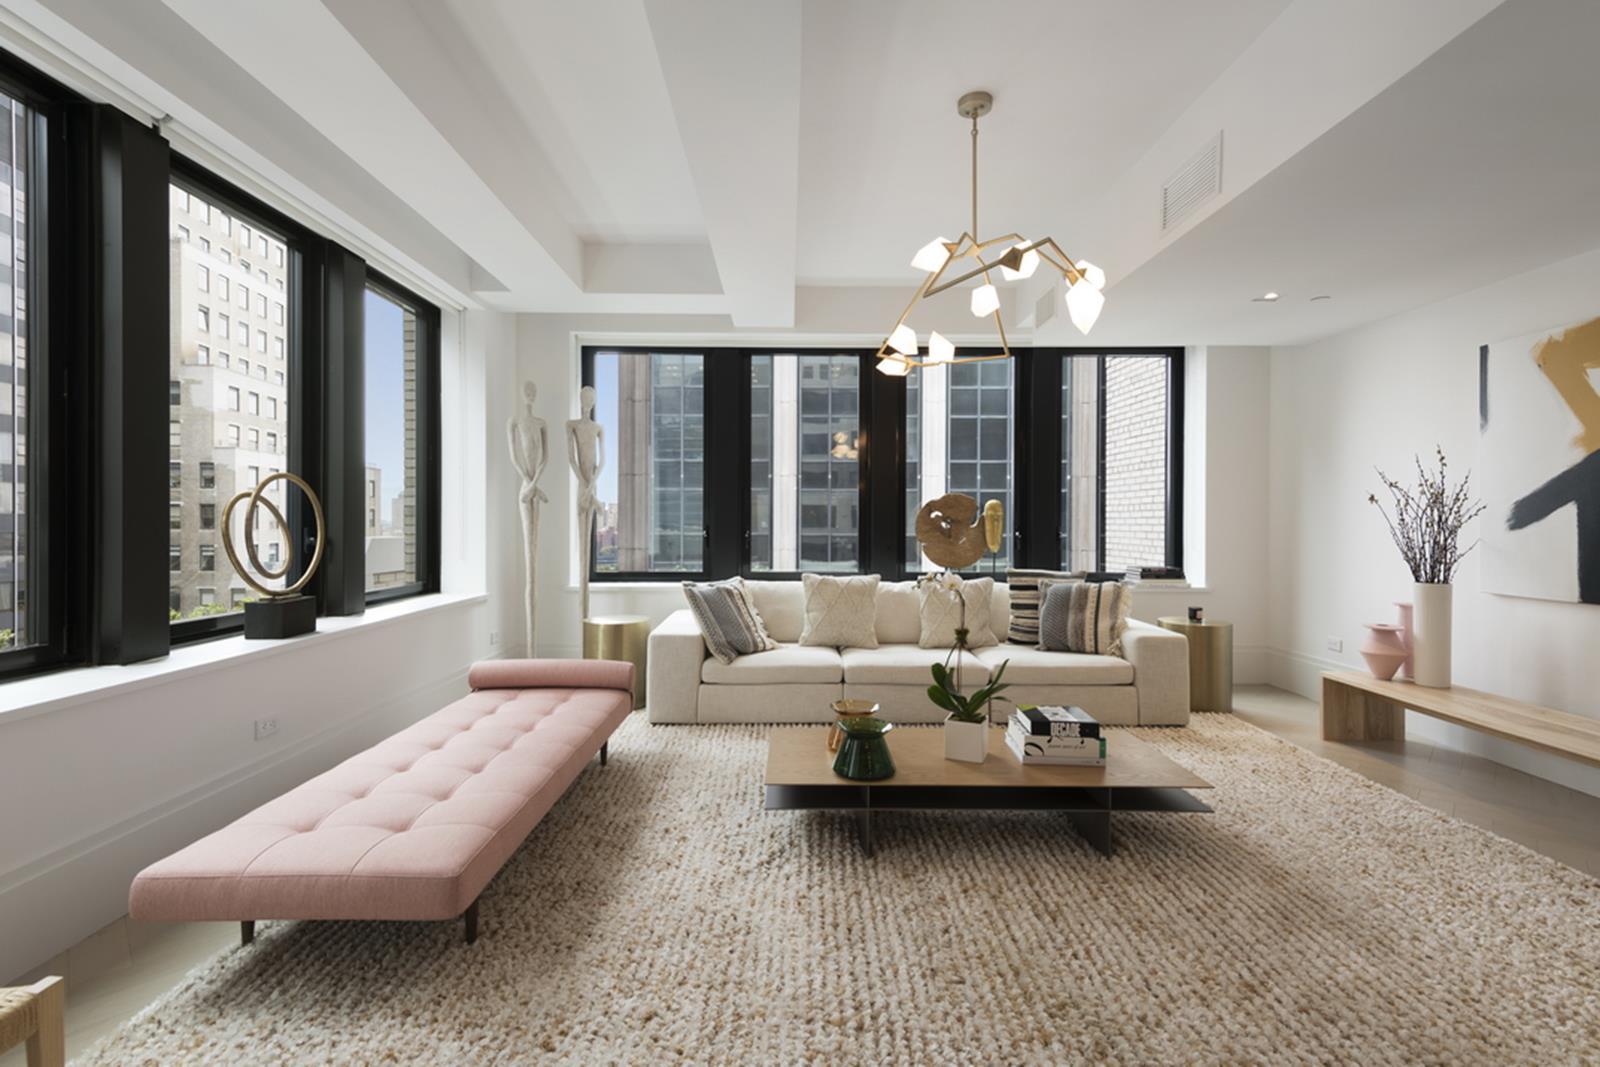 101 Wall Street, Financial District, New York